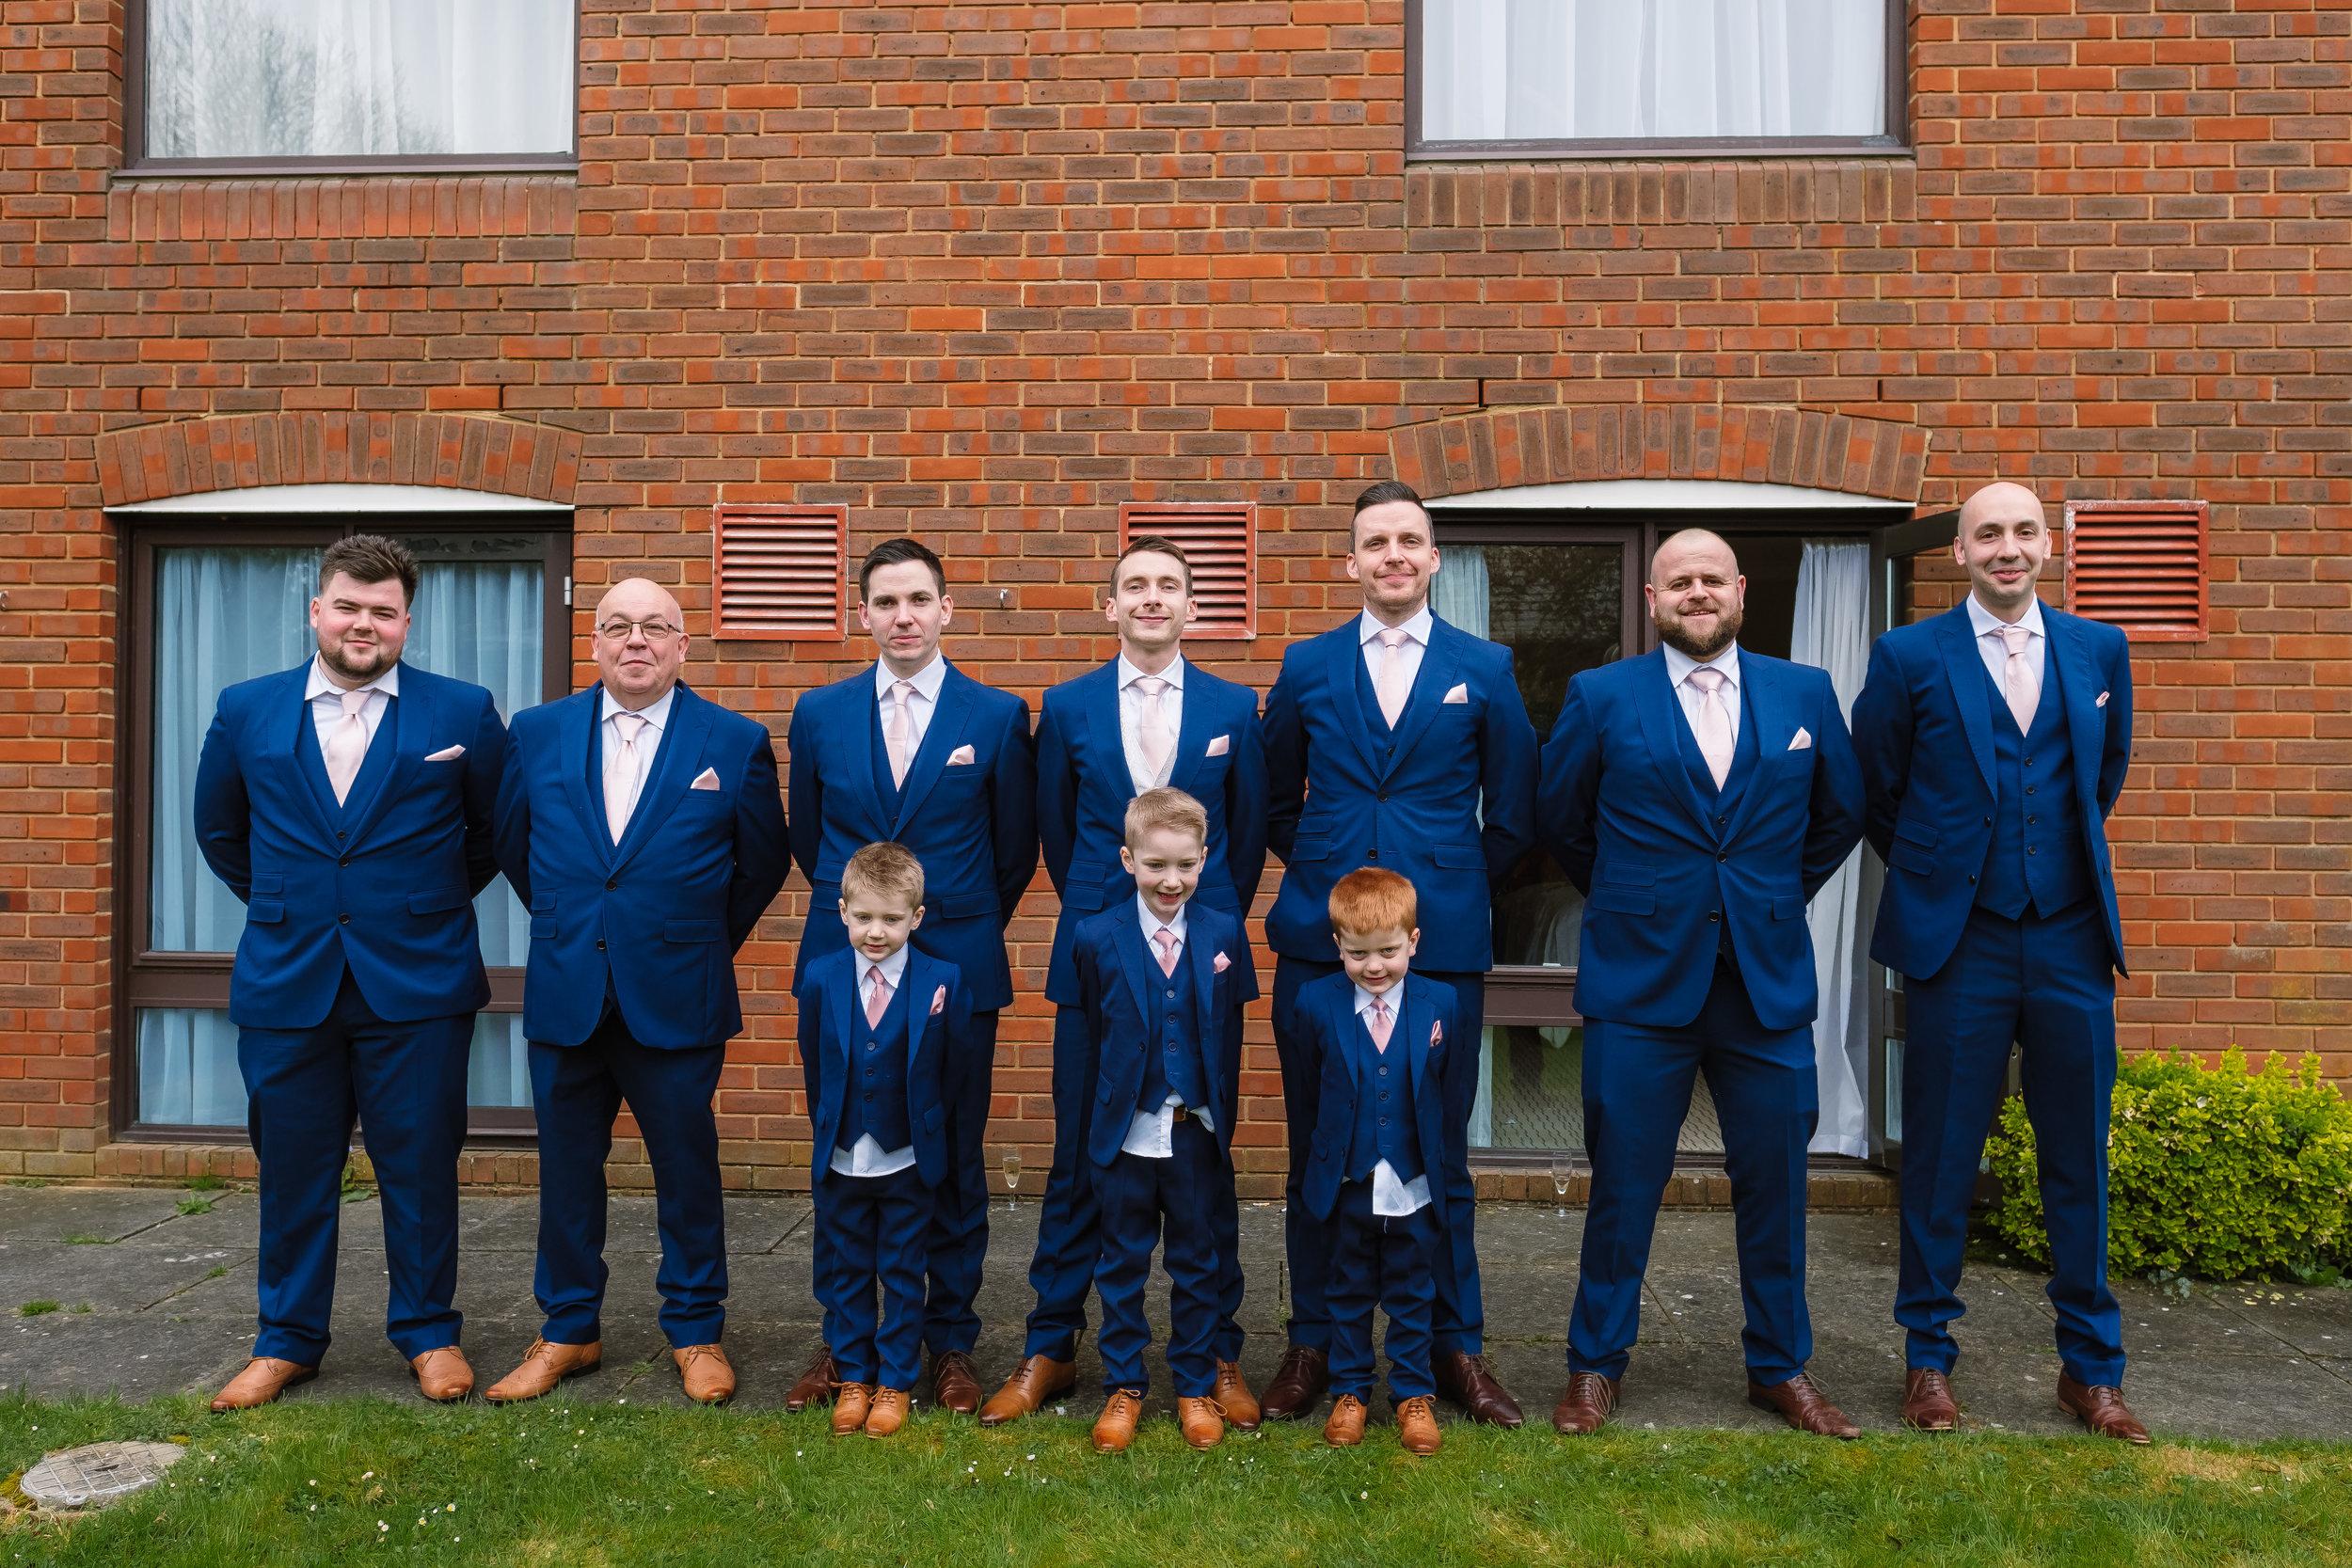 Sarah-Fishlock-Photography : Hampshire-wedding-photographer-hampshire : fleet-wedding-photographer-fleet : Northbrook-Park-Wedding-Photographer : Northbrook-Park-Wedding-Venue : natural-wedding-photographer-hampshire-169.jpg